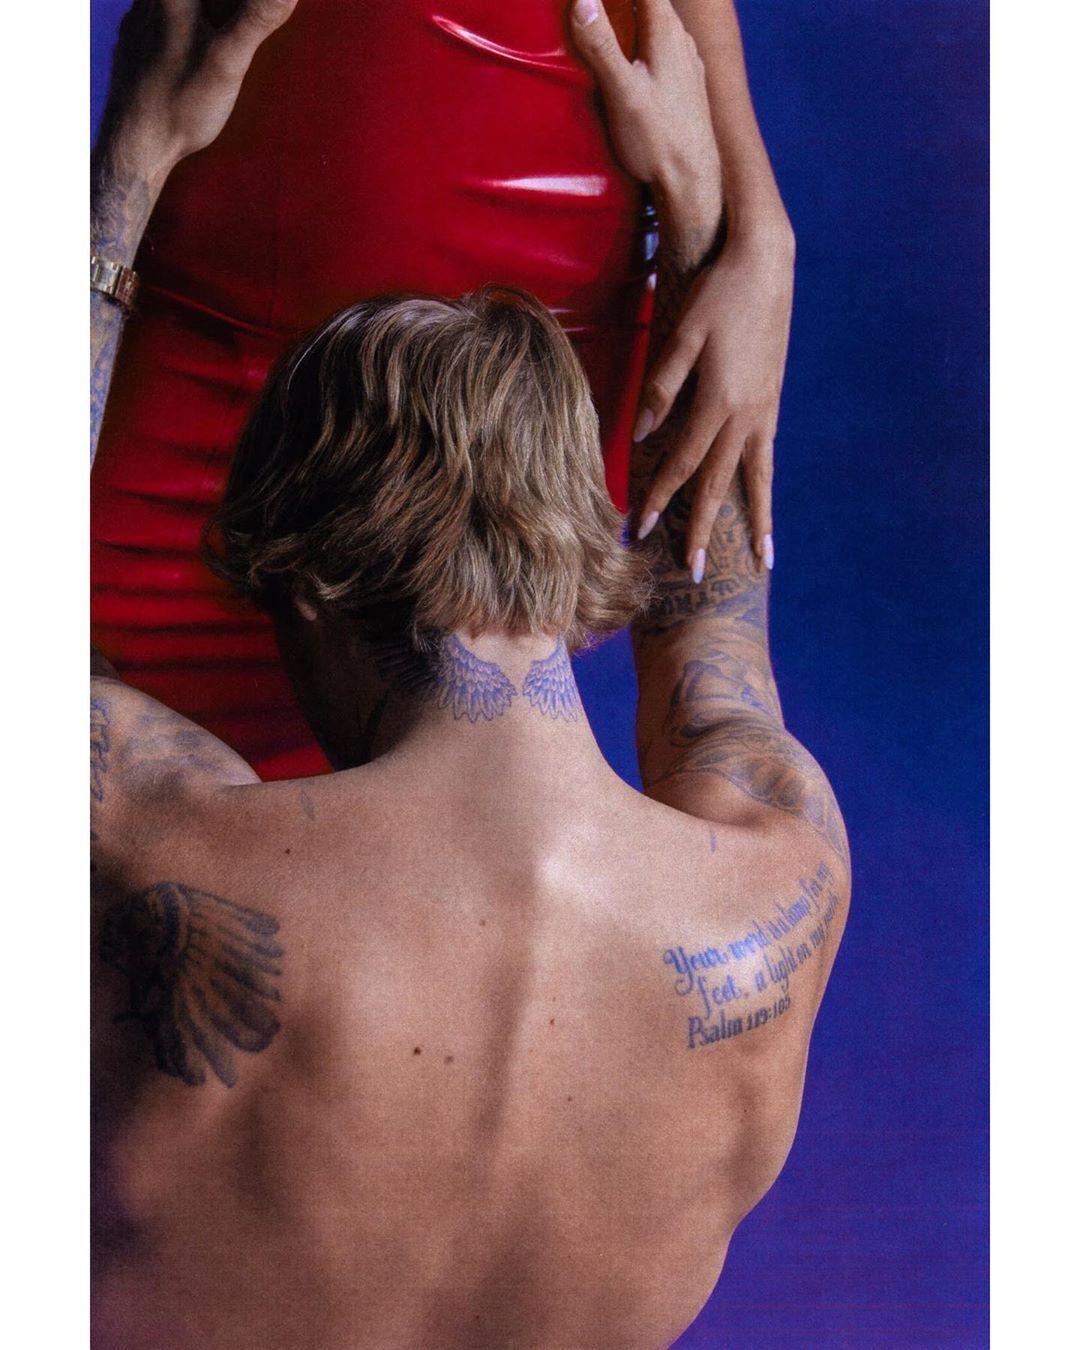 Пара снялась в фотосессии от Vogue Italia.